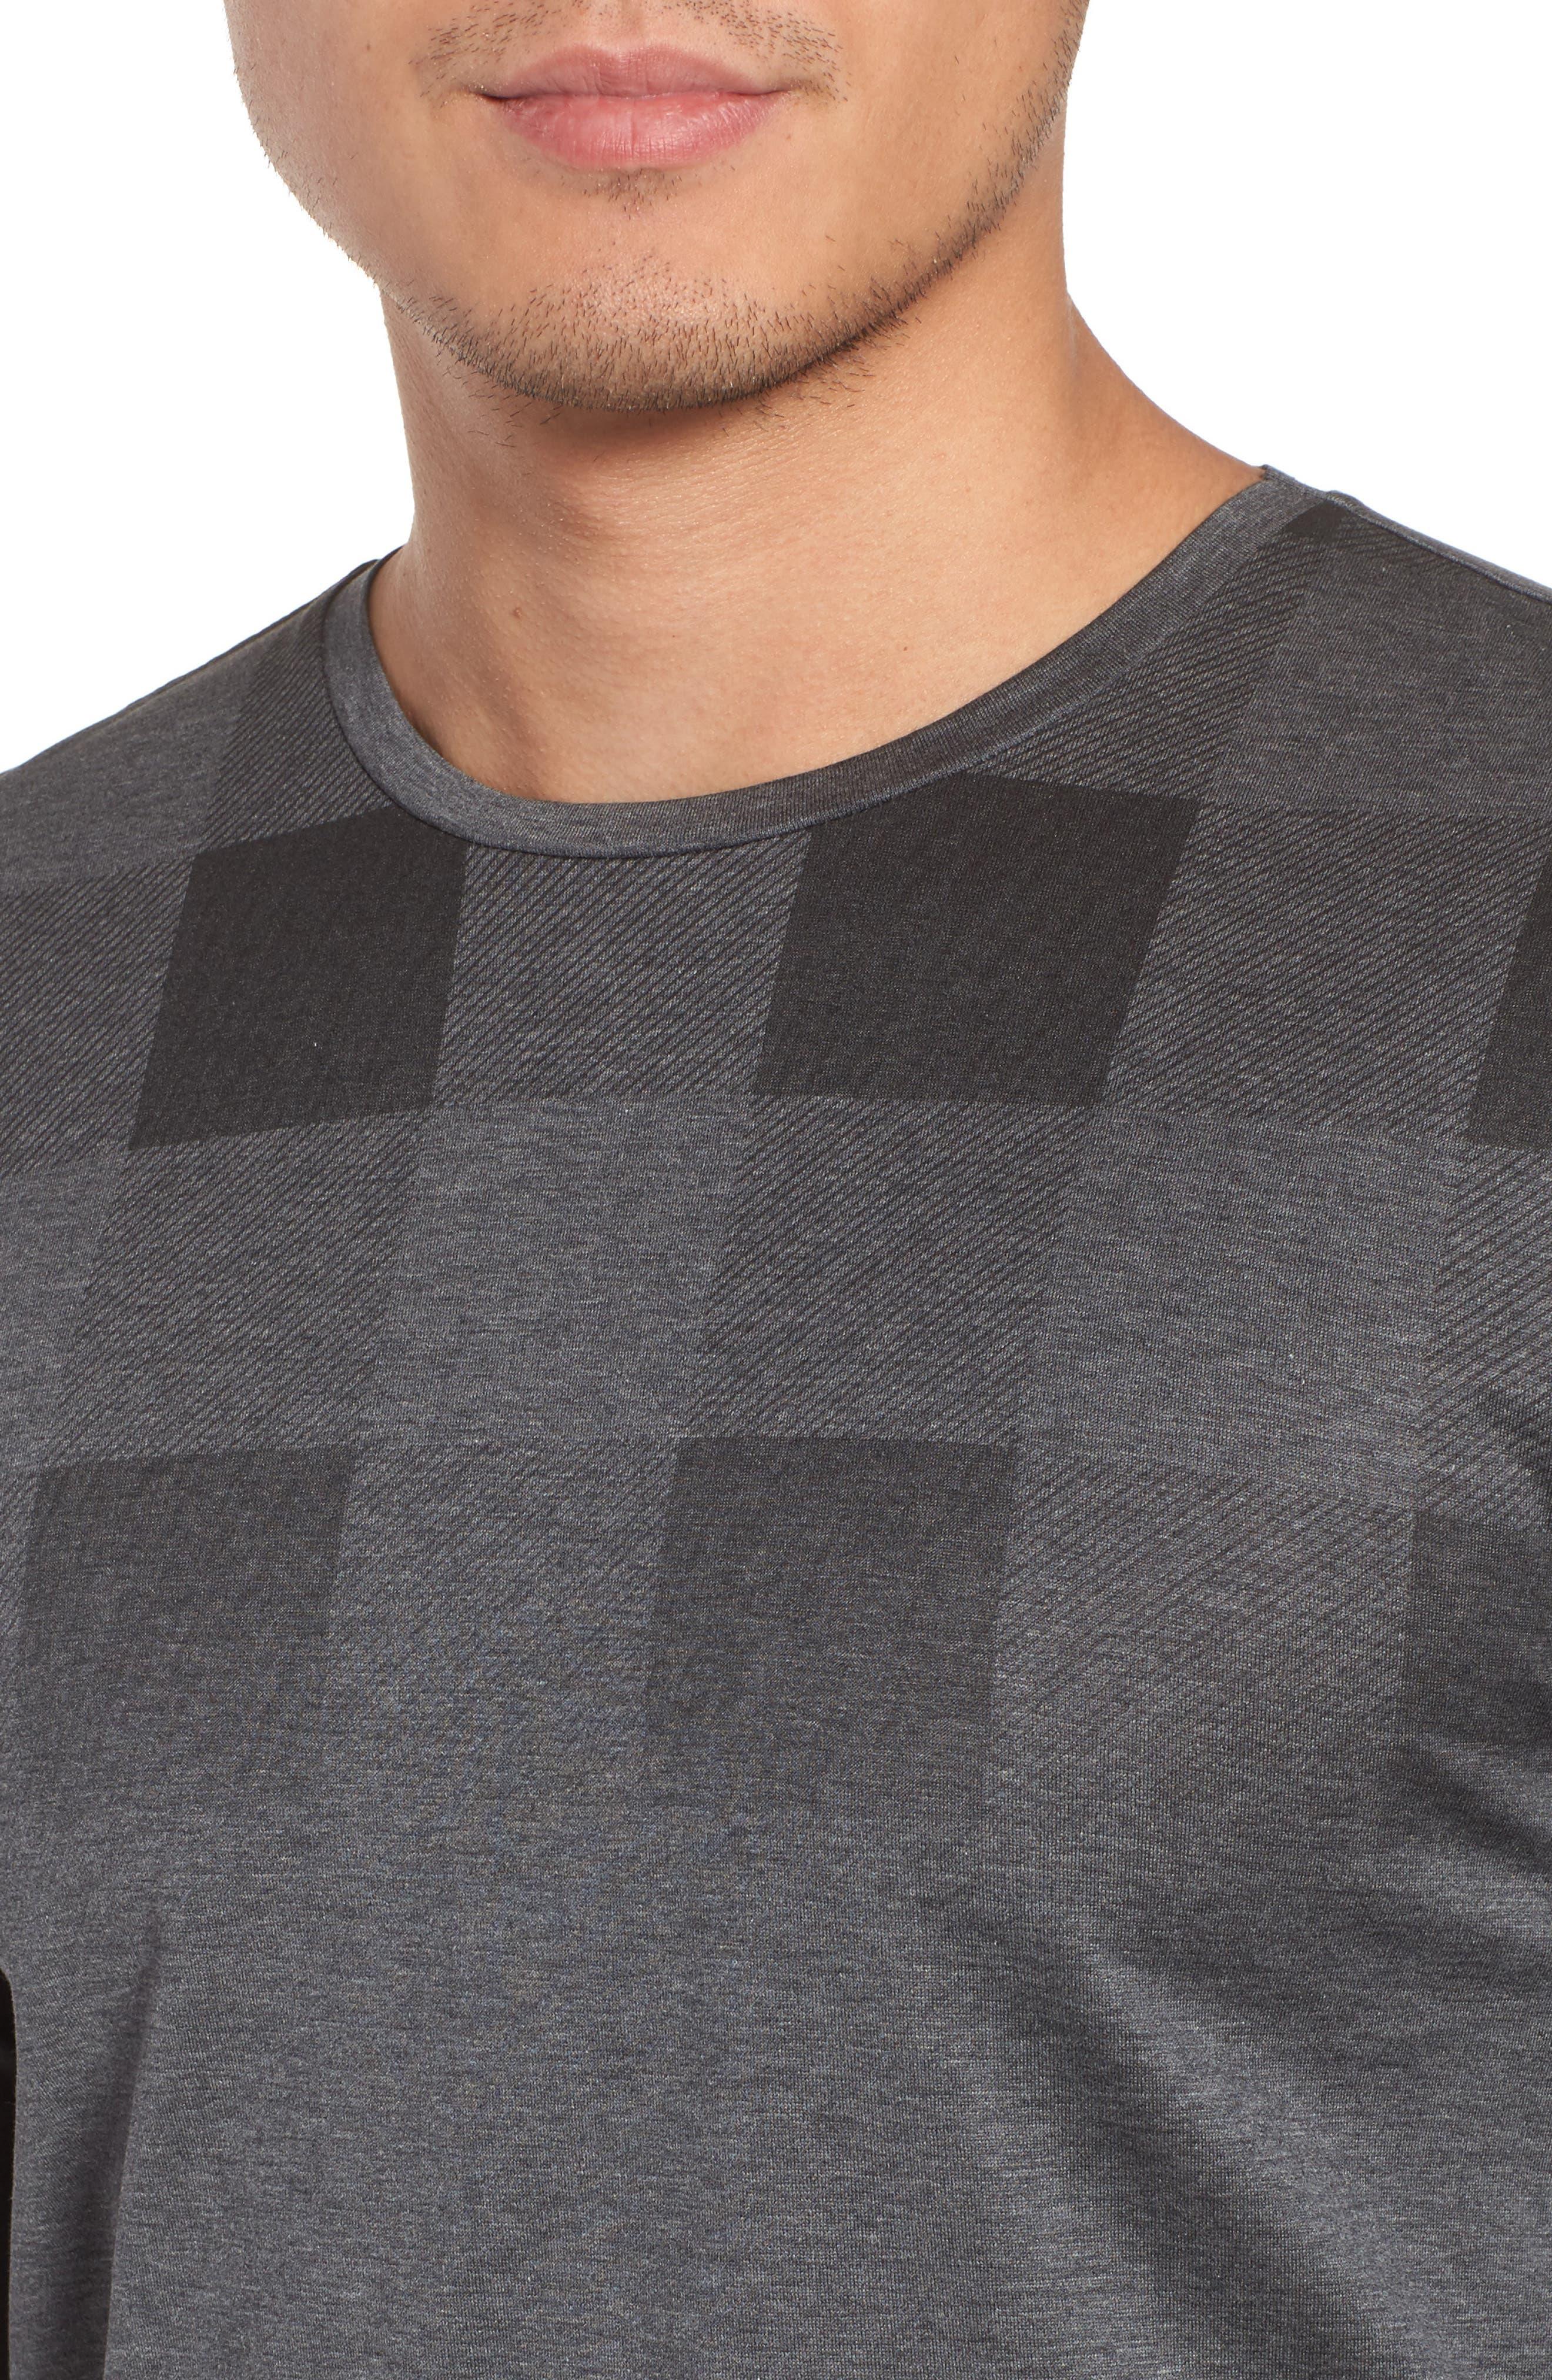 Tenison Slim Fit Ombre Check Long Sleeve T-shirt,                             Alternate thumbnail 4, color,                             030